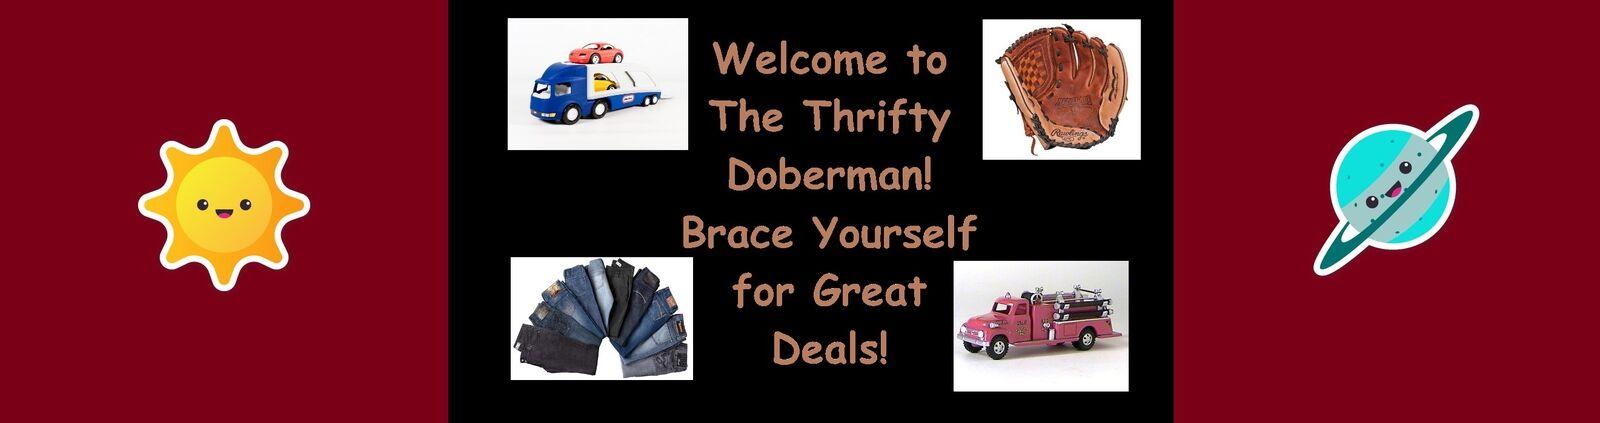 The Thrifty Doberman